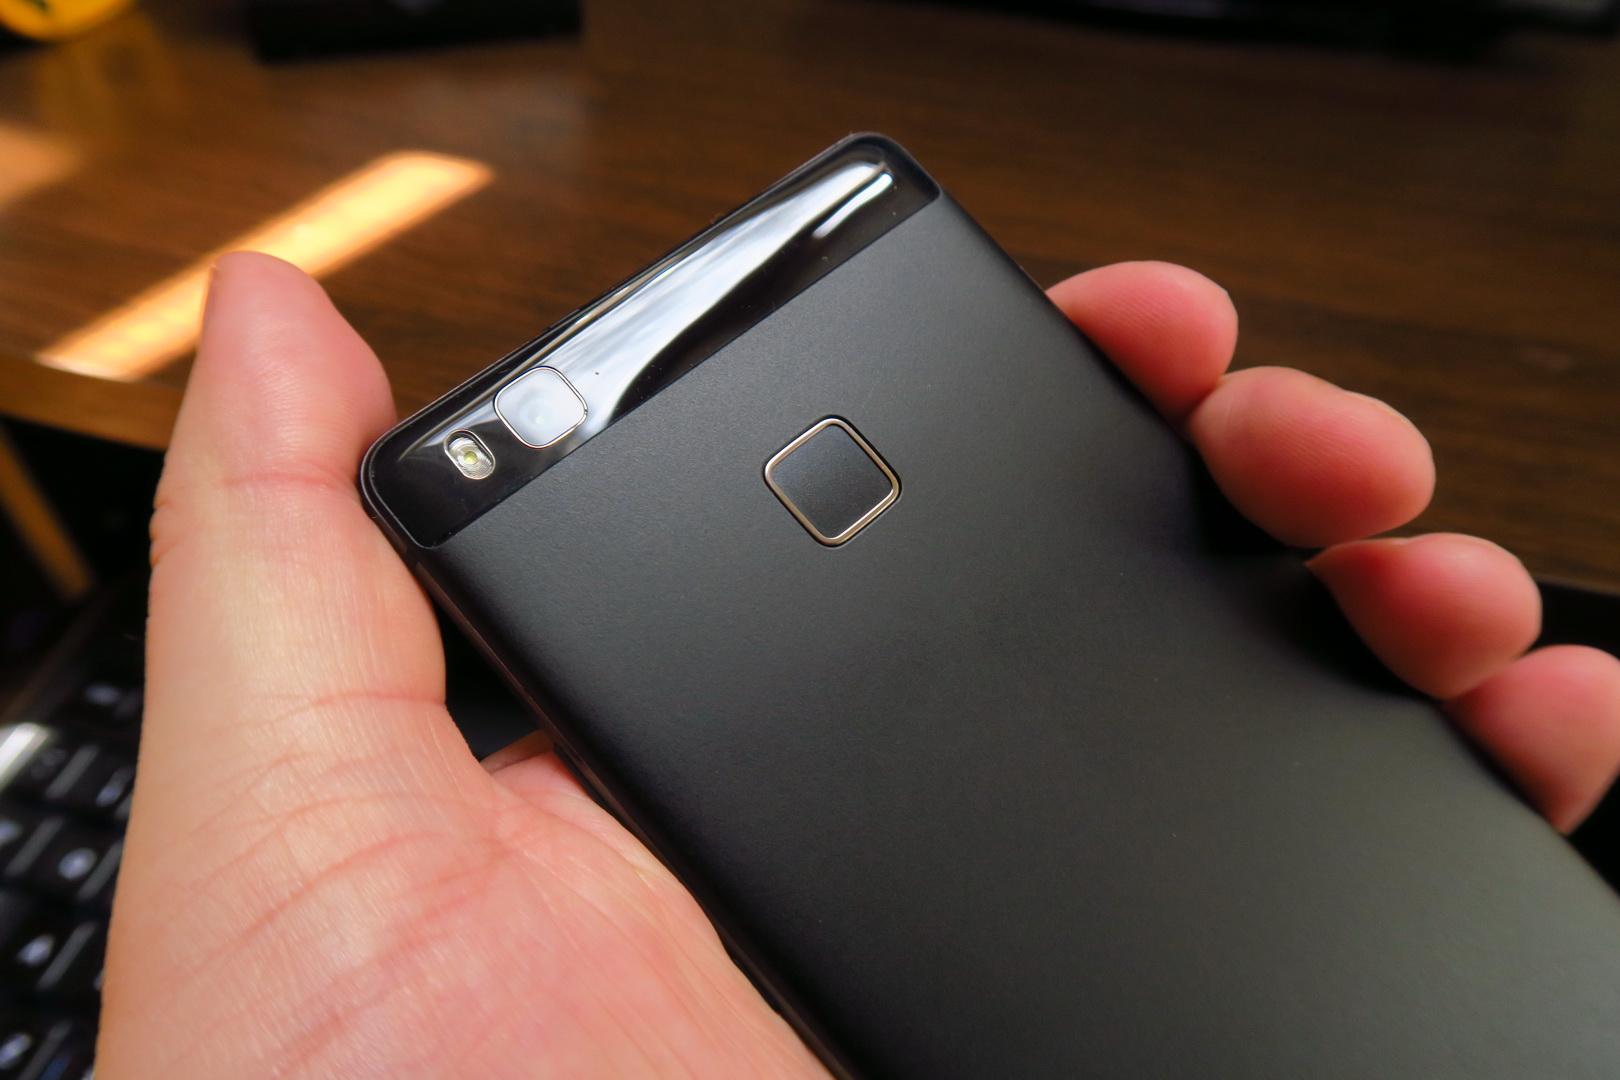 Huawei P9 Lite Review: More Than a P8 Lite Follow-up, Good ...